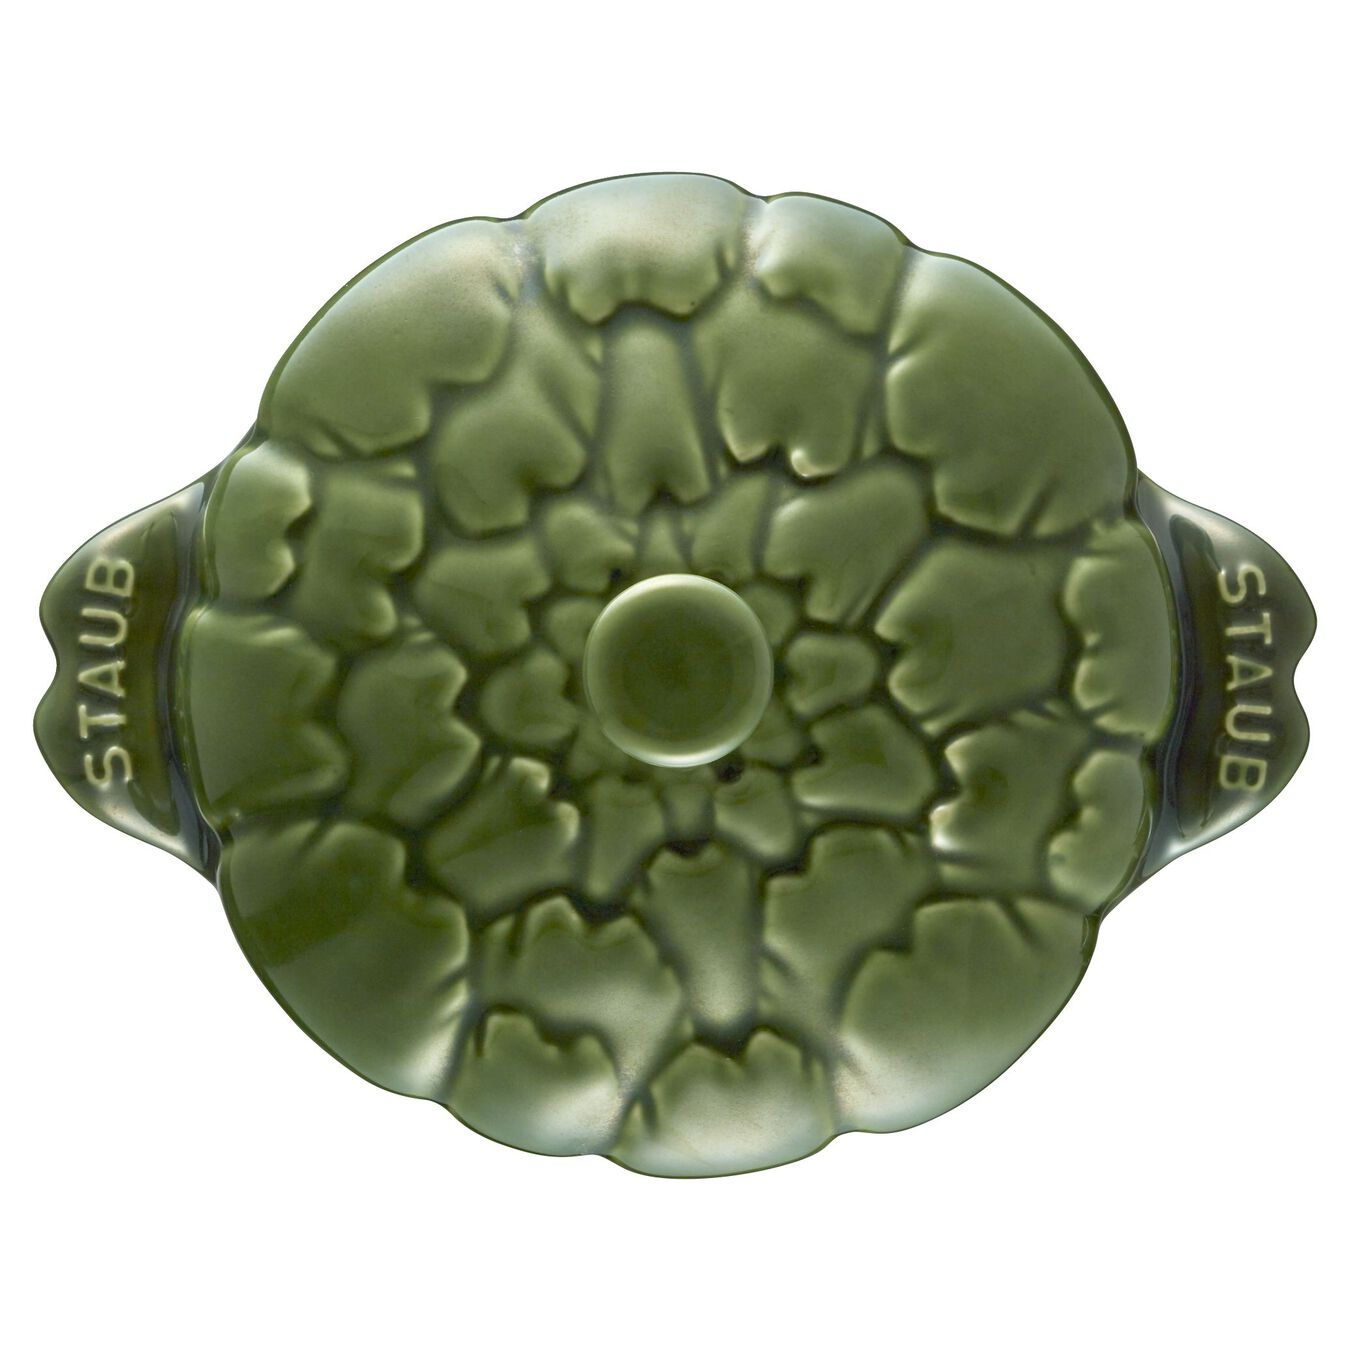 Cocotte 13 cm, Artischocke, Basilikum-Grün, Keramik,,large 11